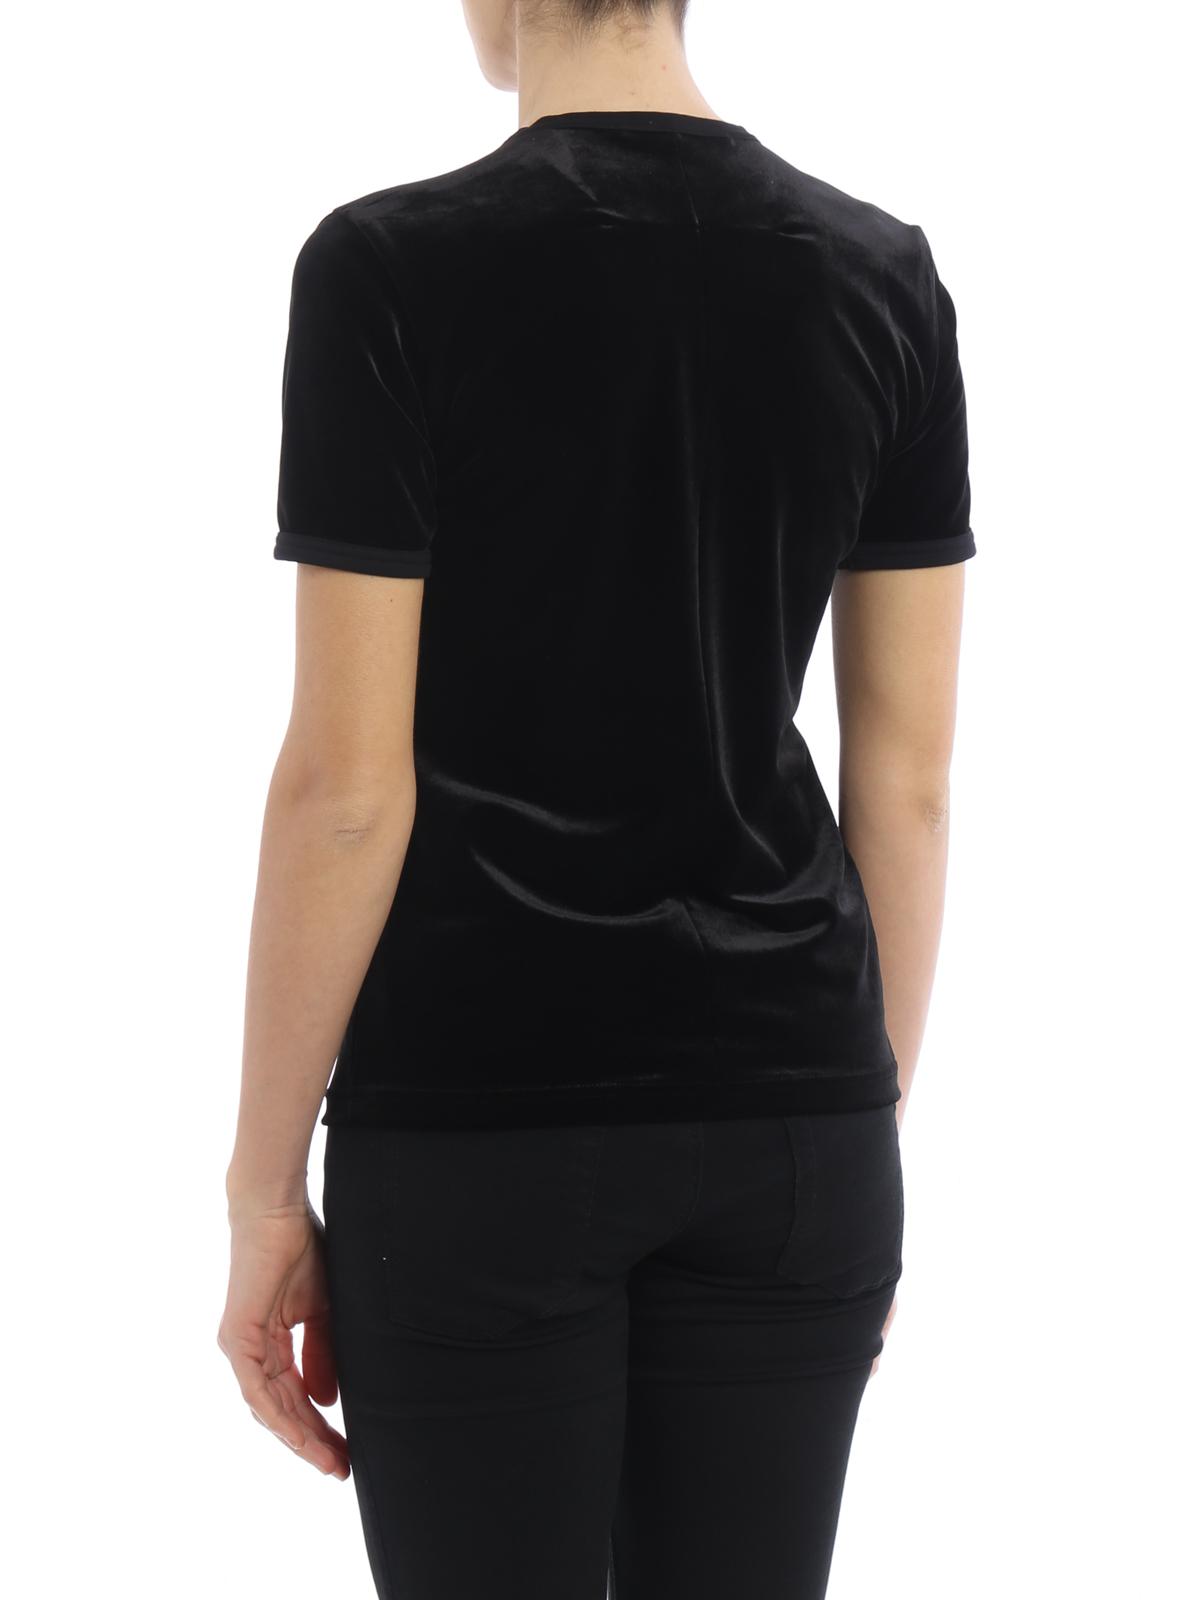 Flamingo print velvet t shirt by givenchy t shirts ikrix for Givenchy t shirts for sale